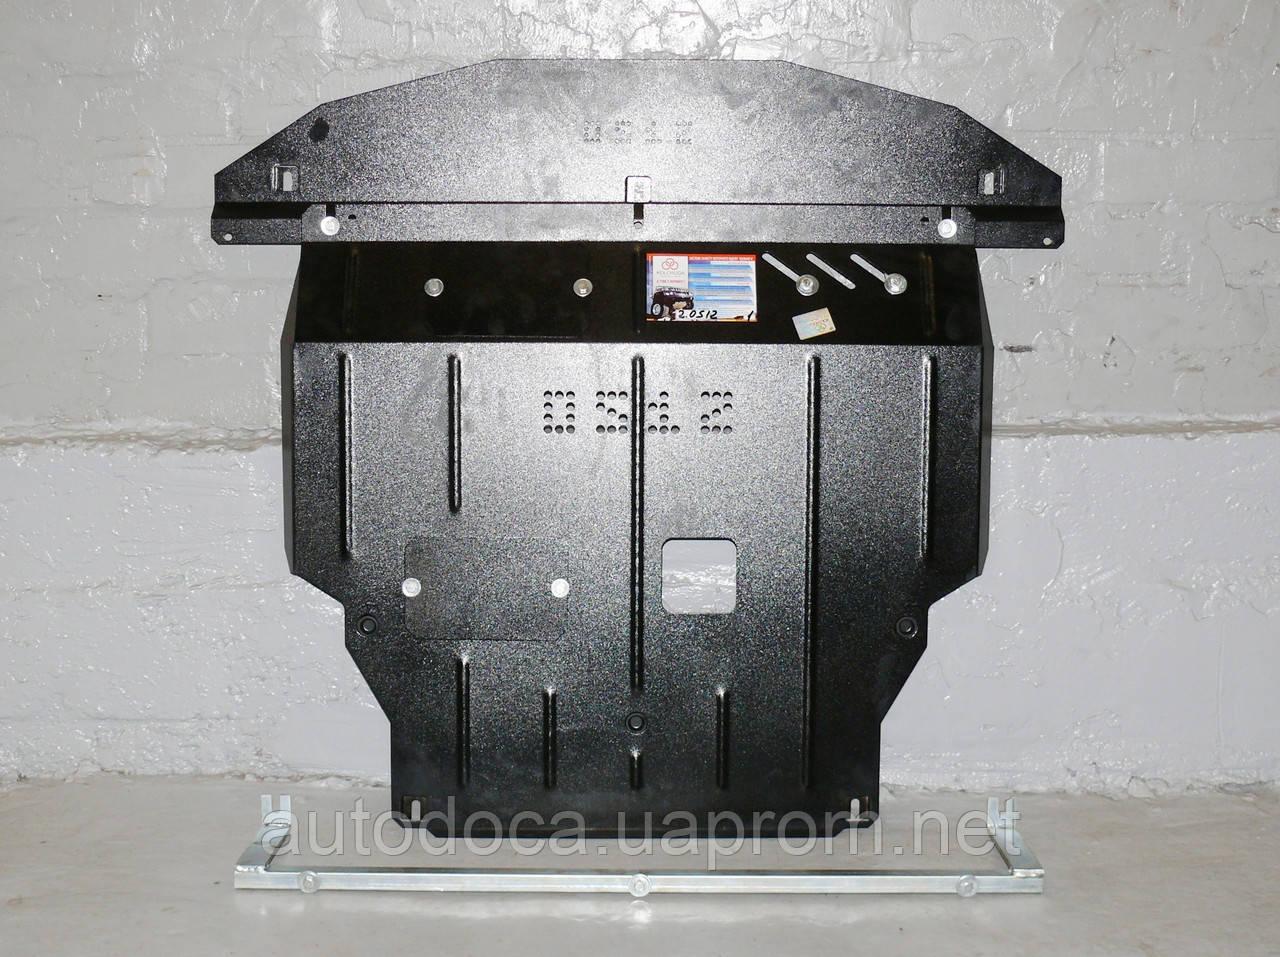 Захист картера двигуна і кпп Kia Sorento 2012-